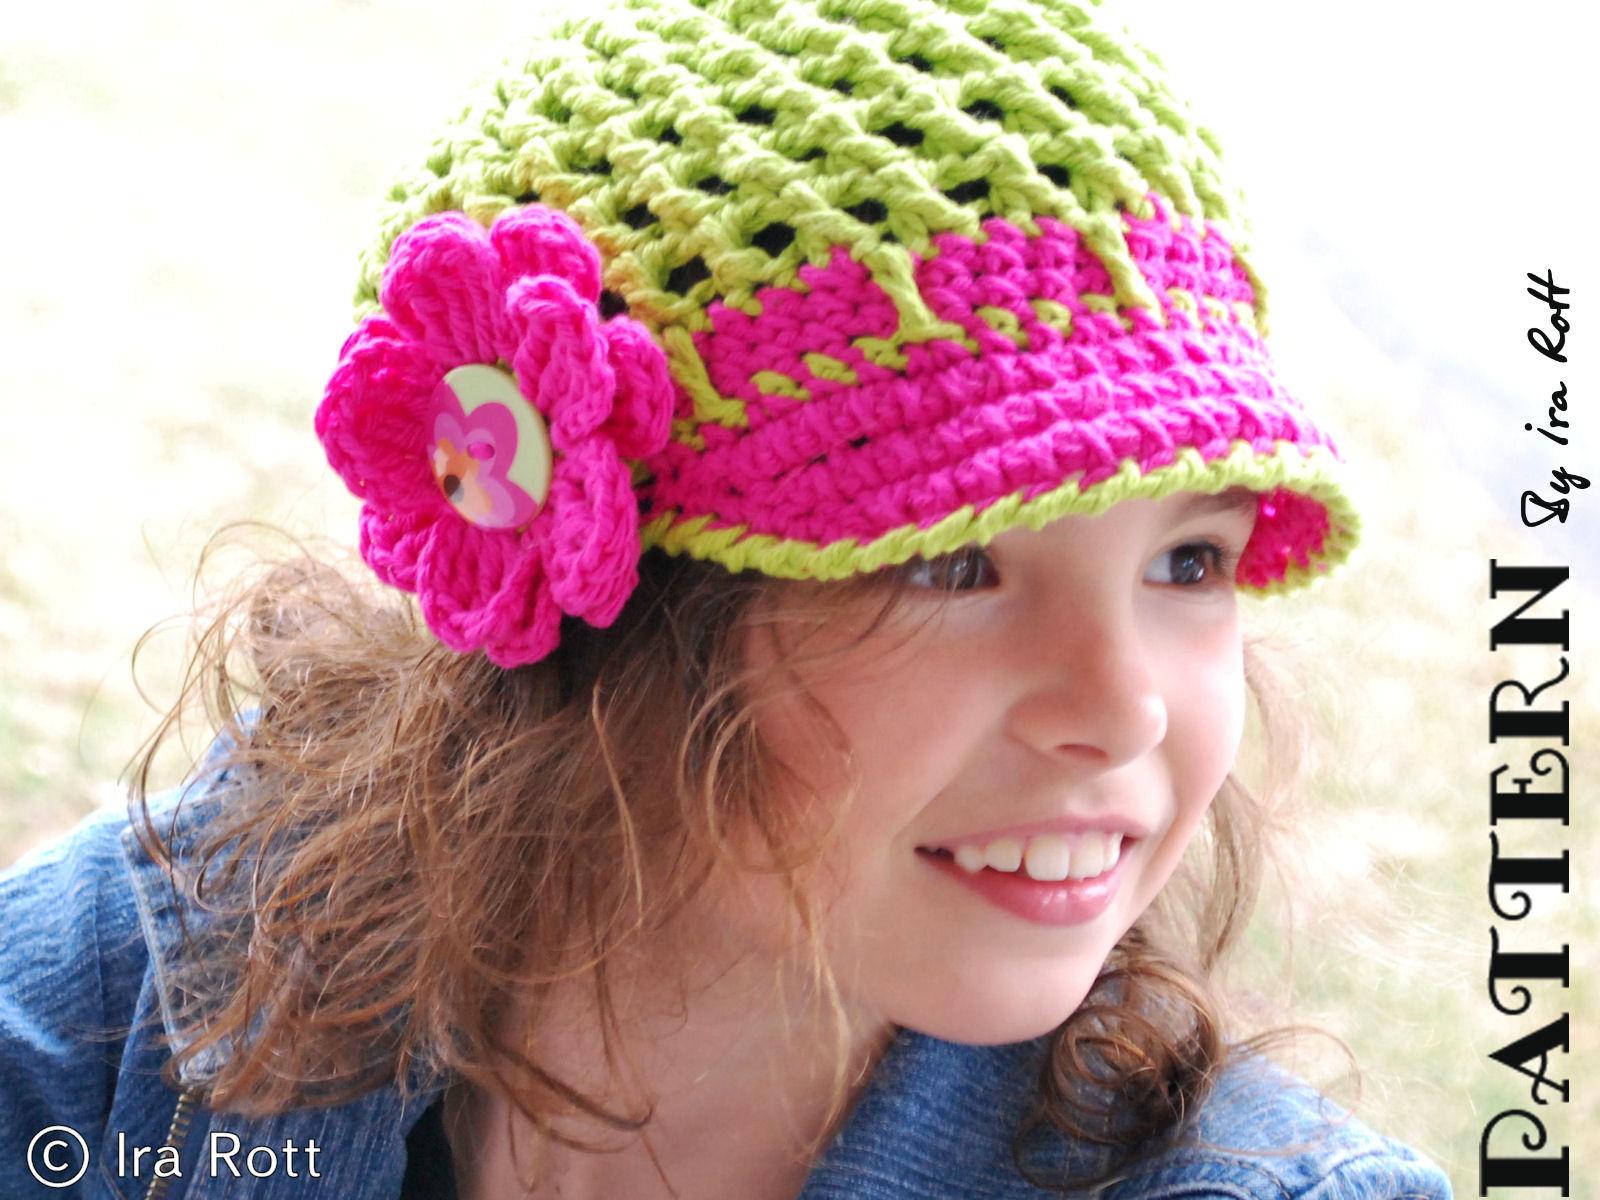 Fashion Crochet Design By Ira Rott  Spring News Boy Hat - Cap With ... 7873615c0